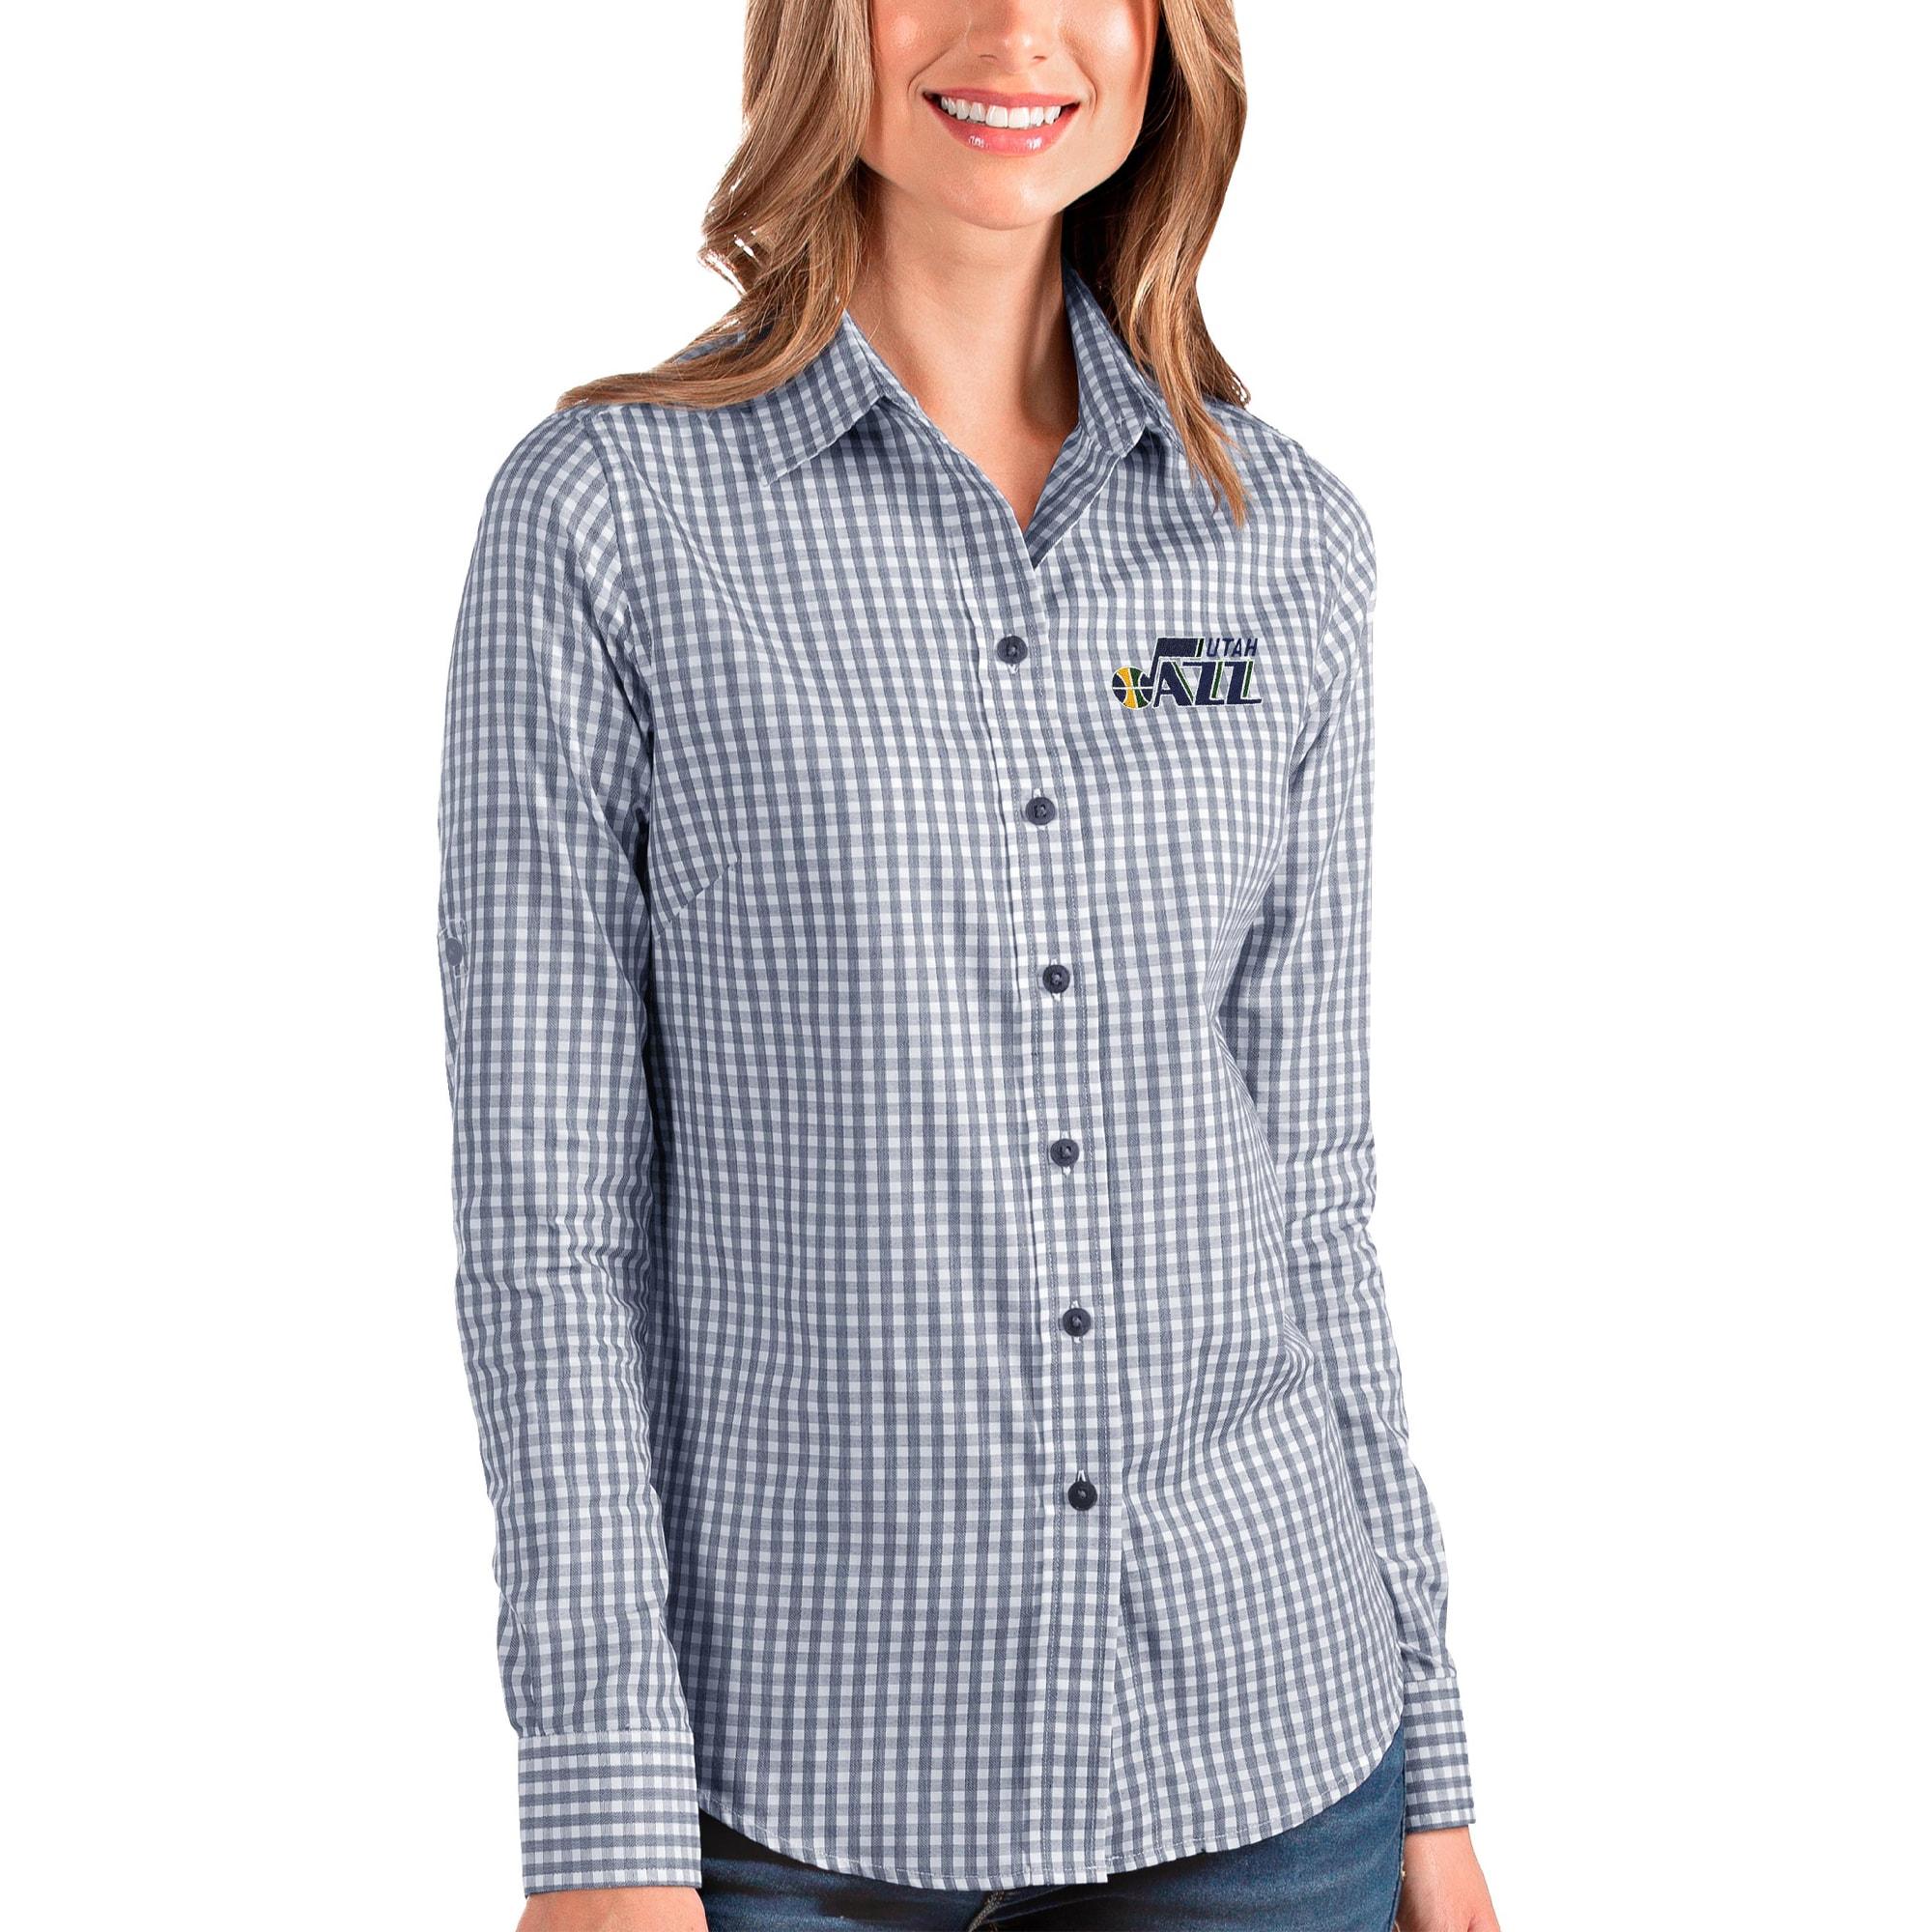 Utah Jazz Antigua Women's Structure Button-Up Long Sleeve Shirt - Navy/White